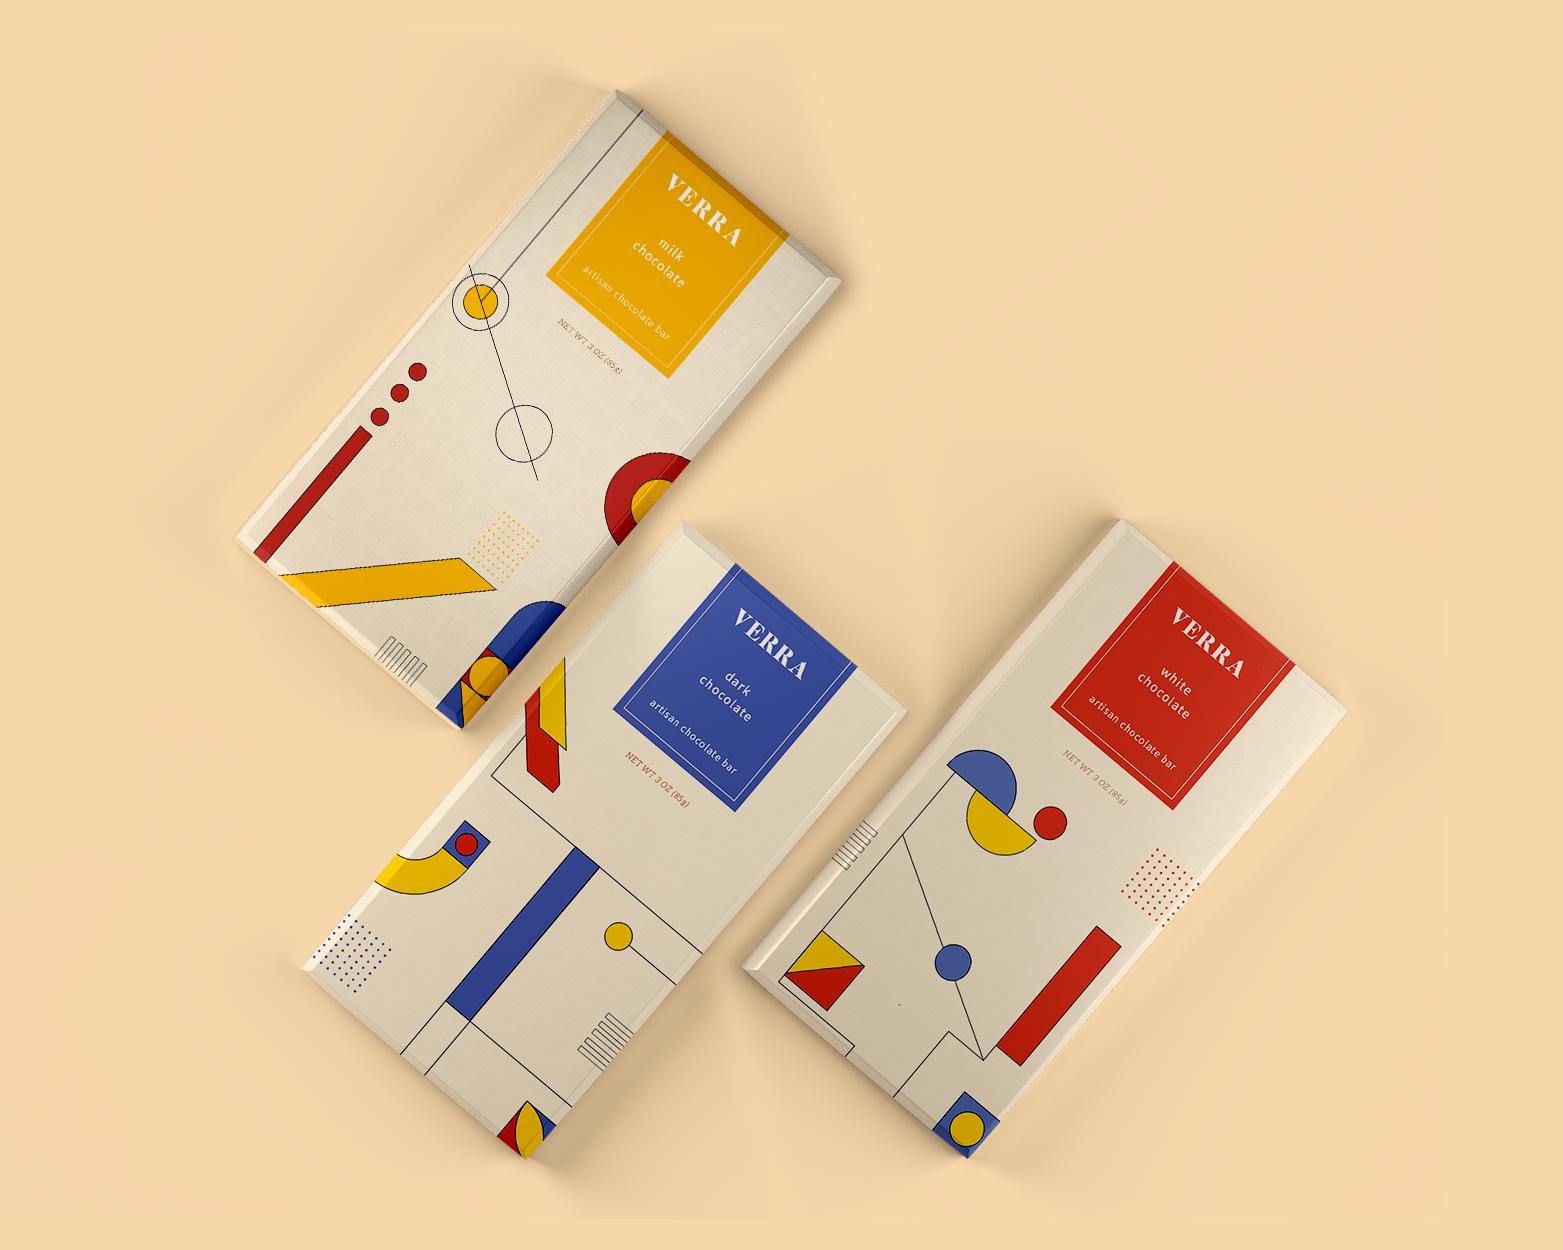 Fyne Space Designs an Artisan Chocolate Packaging